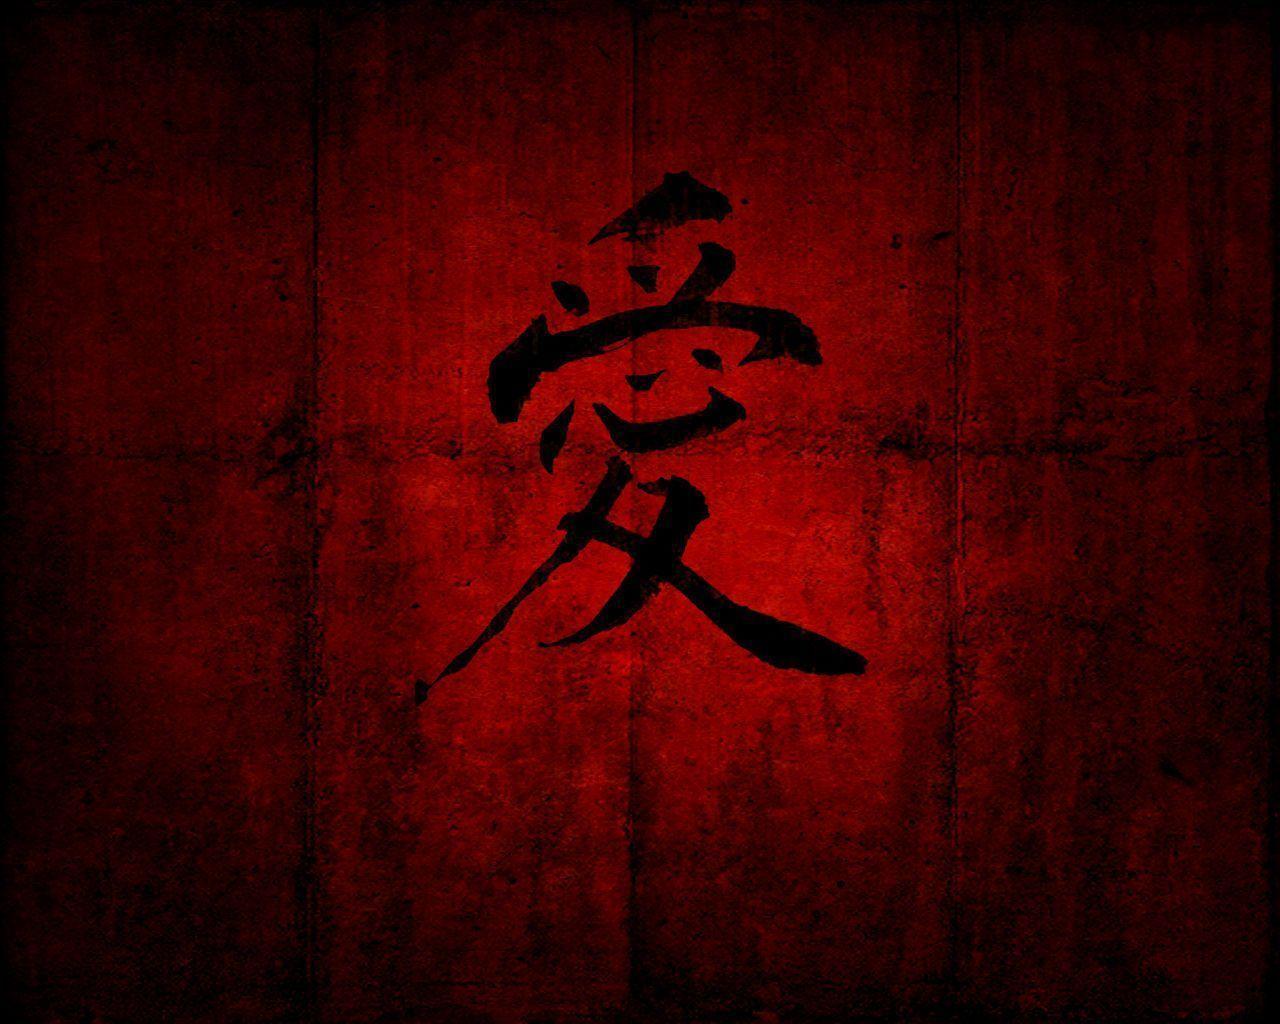 Japanese Kanji Hd Wallpapers Top Free Japanese Kanji Hd Backgrounds Wallpaperaccess